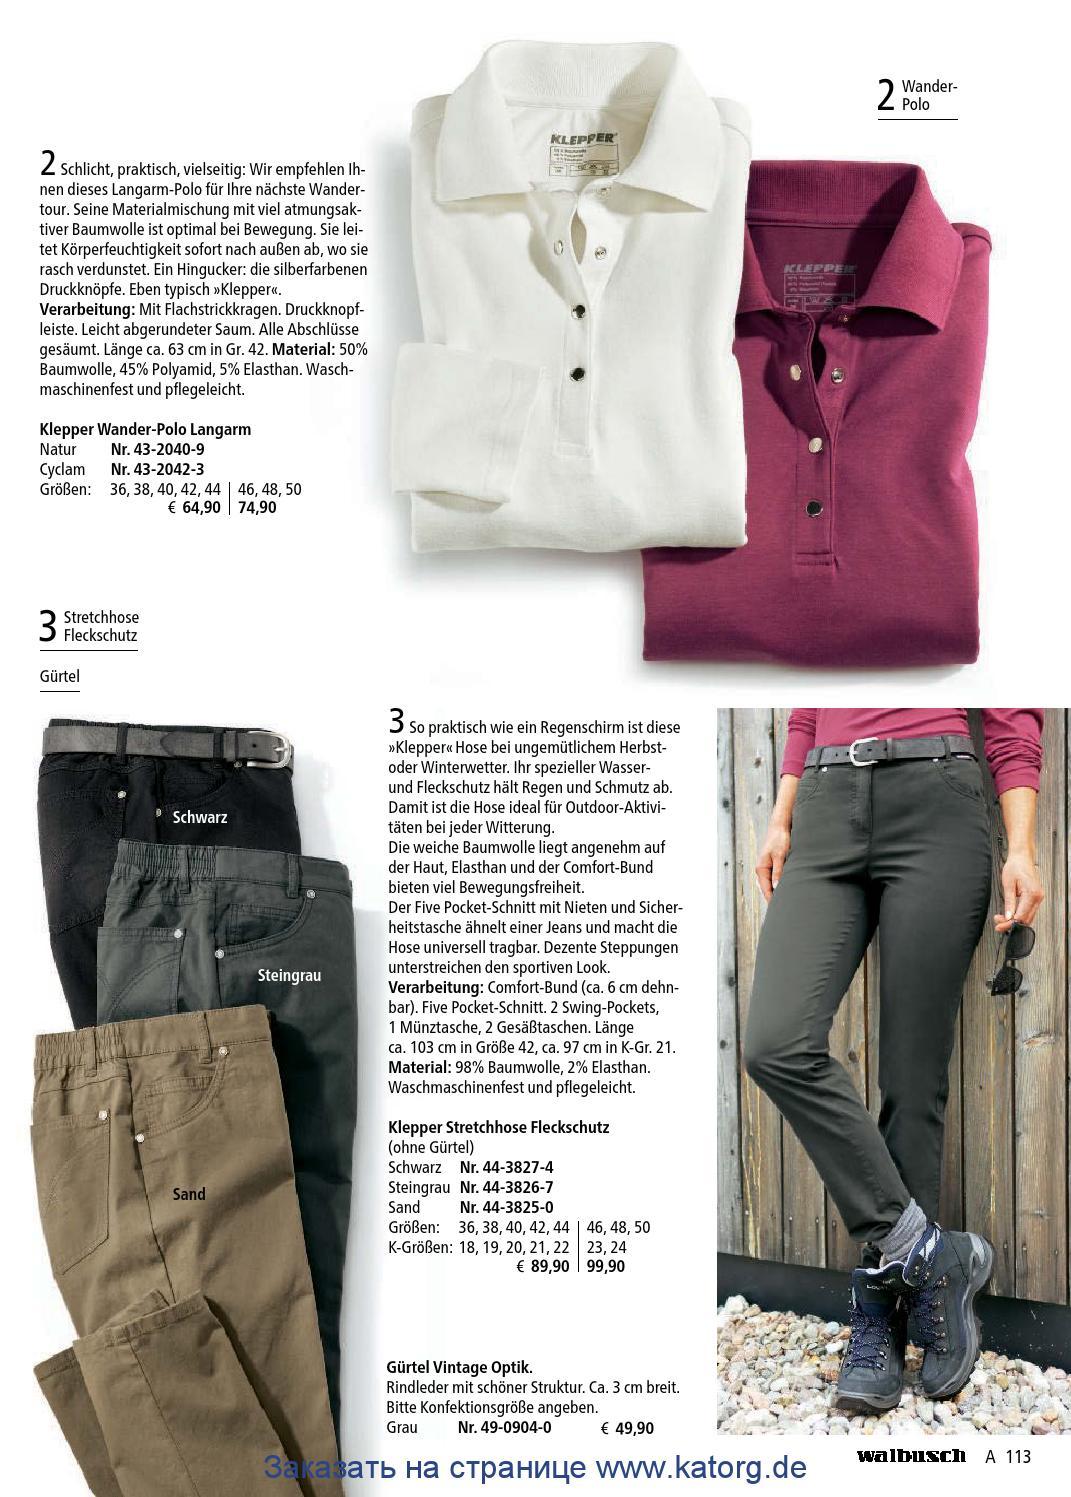 Walbusch 3 by Katorg World of Shopping issuu